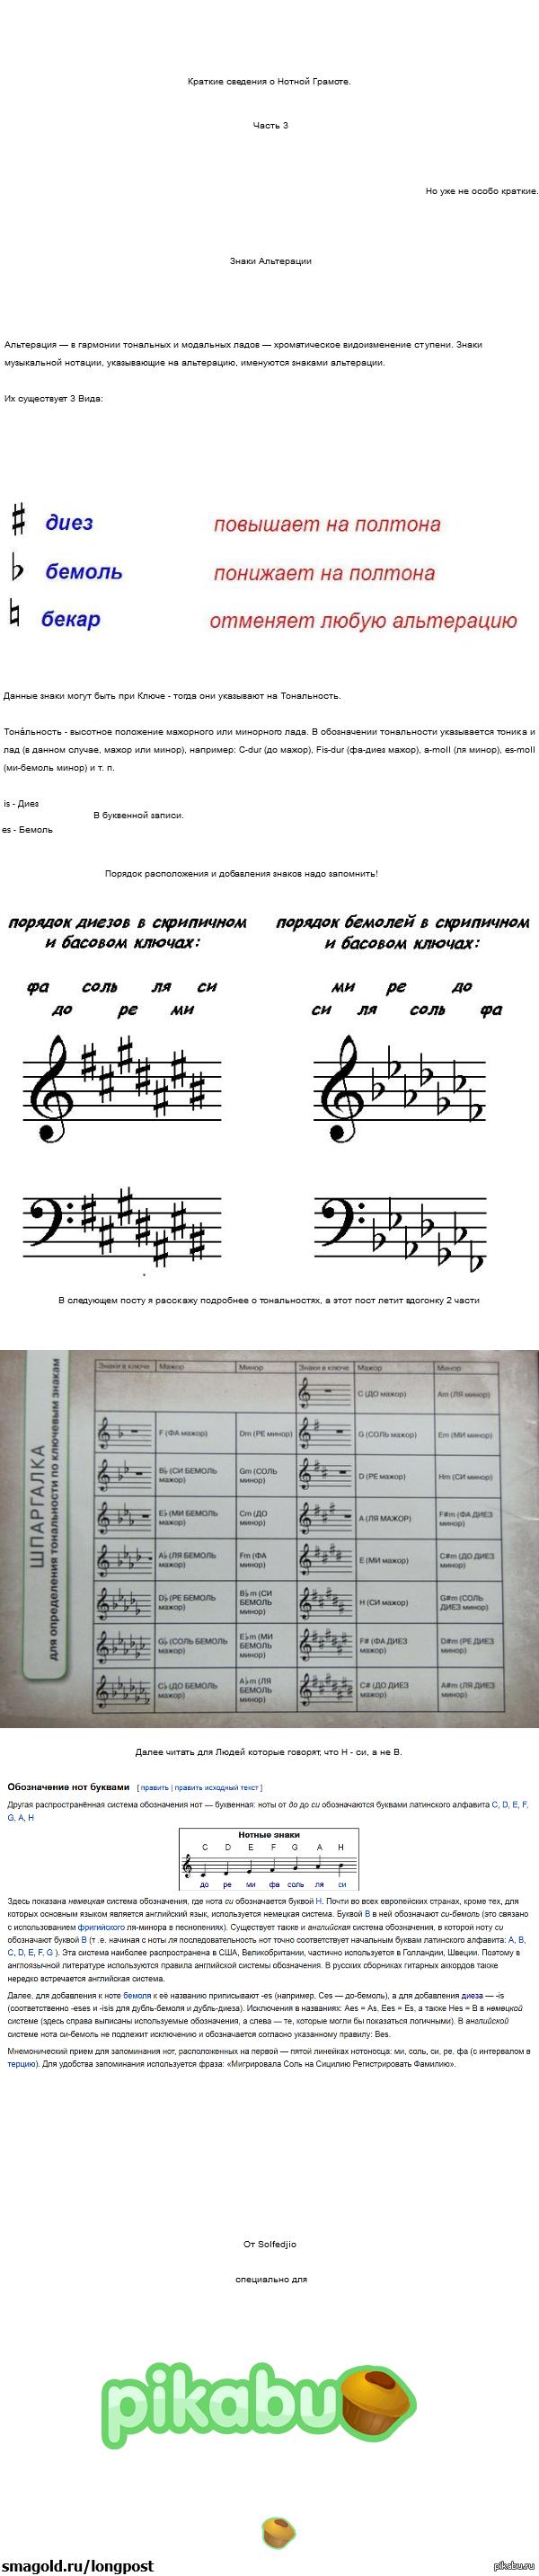 Тест на знание нотной грамоты